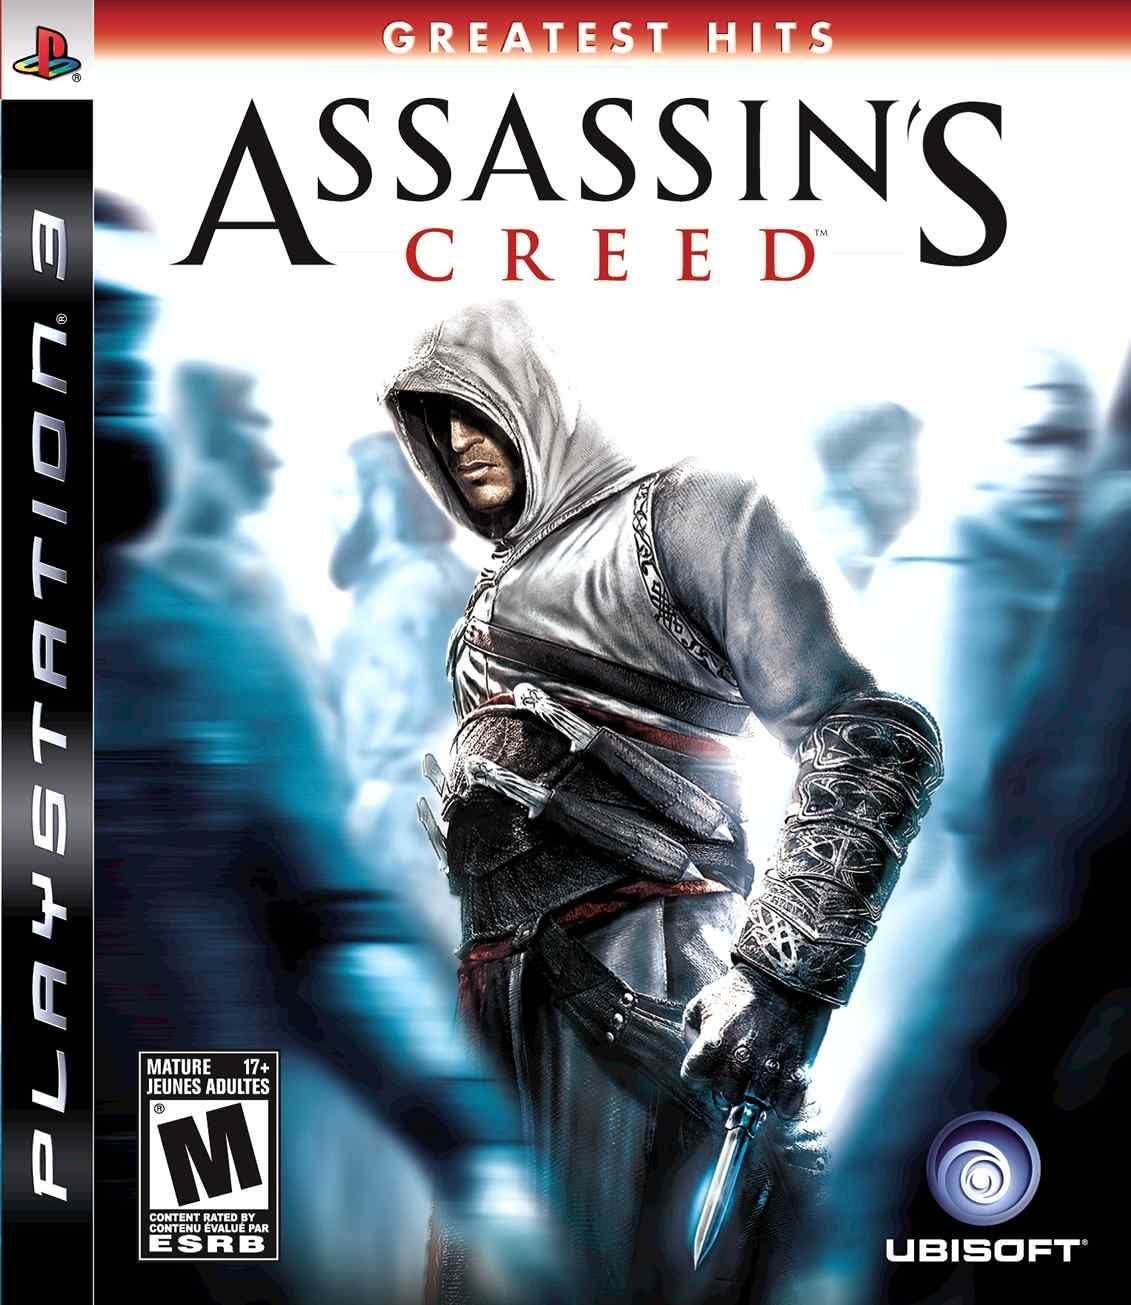 amazon com assassin s creed playstation 3 artist not provided